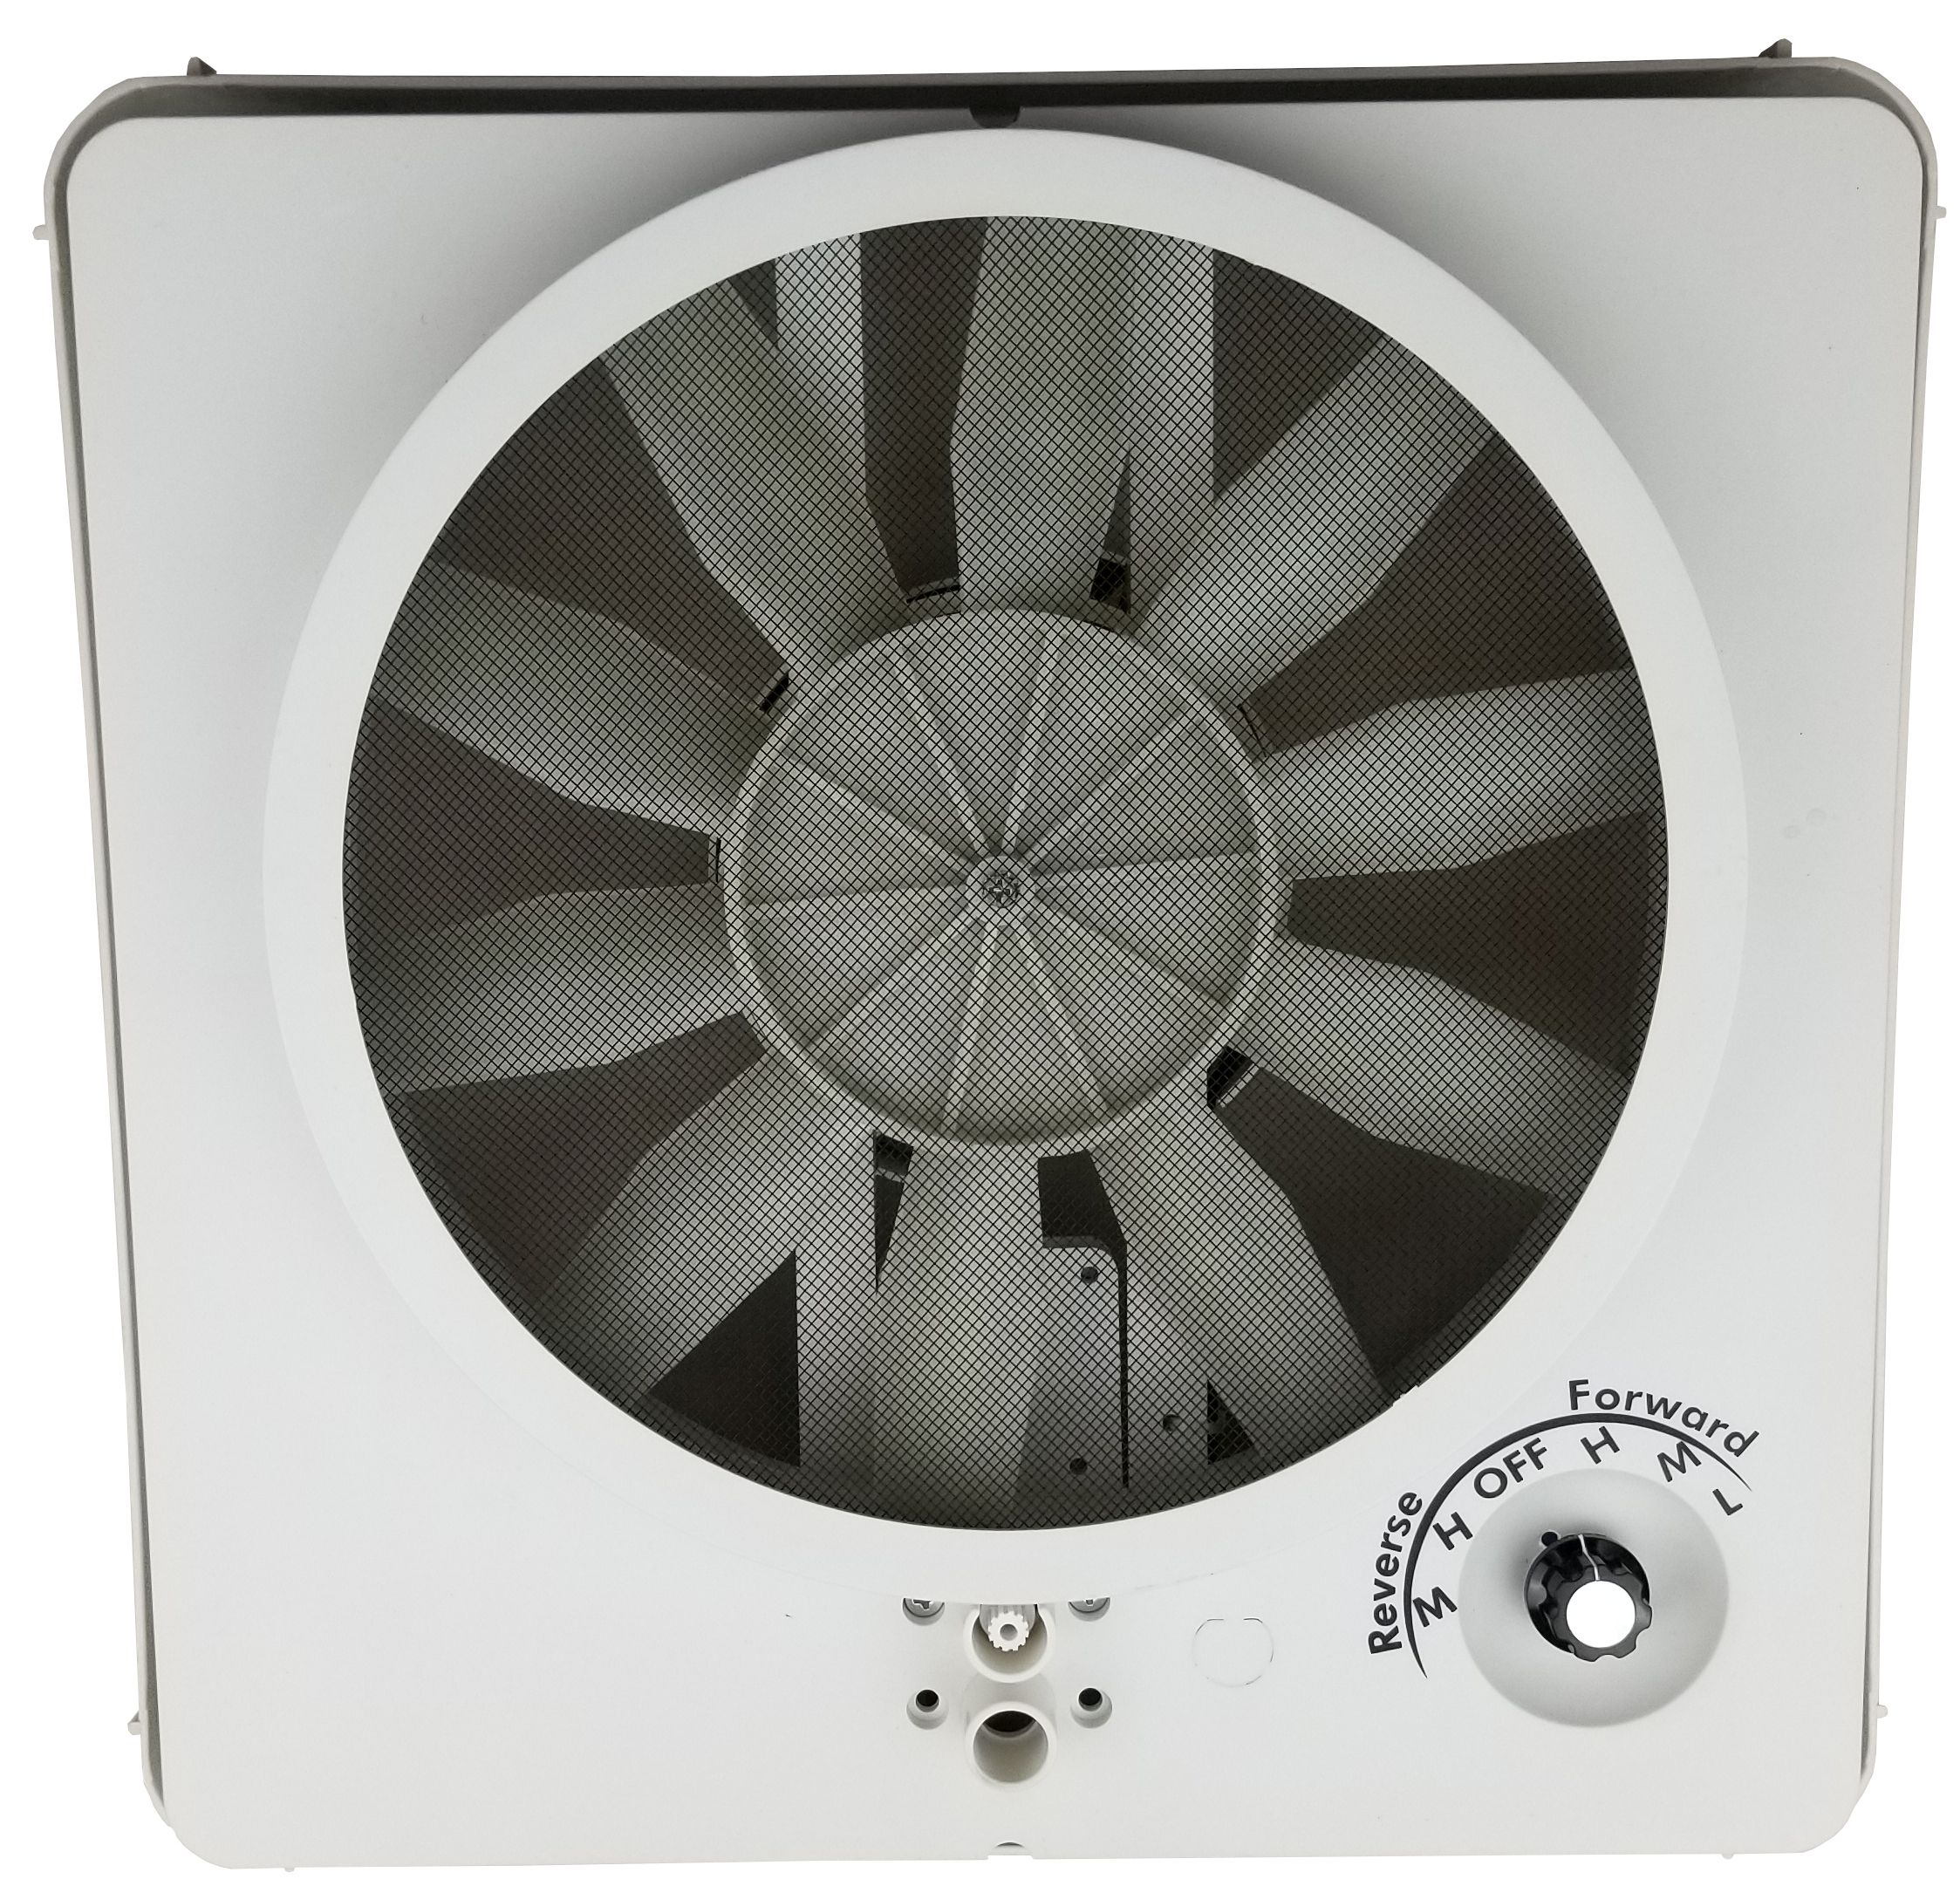 heng\u0027s 90046 cr vortex ii multi speed 12 volt rv roof vent upgrade kit Wiring Harness Wiring- Diagram